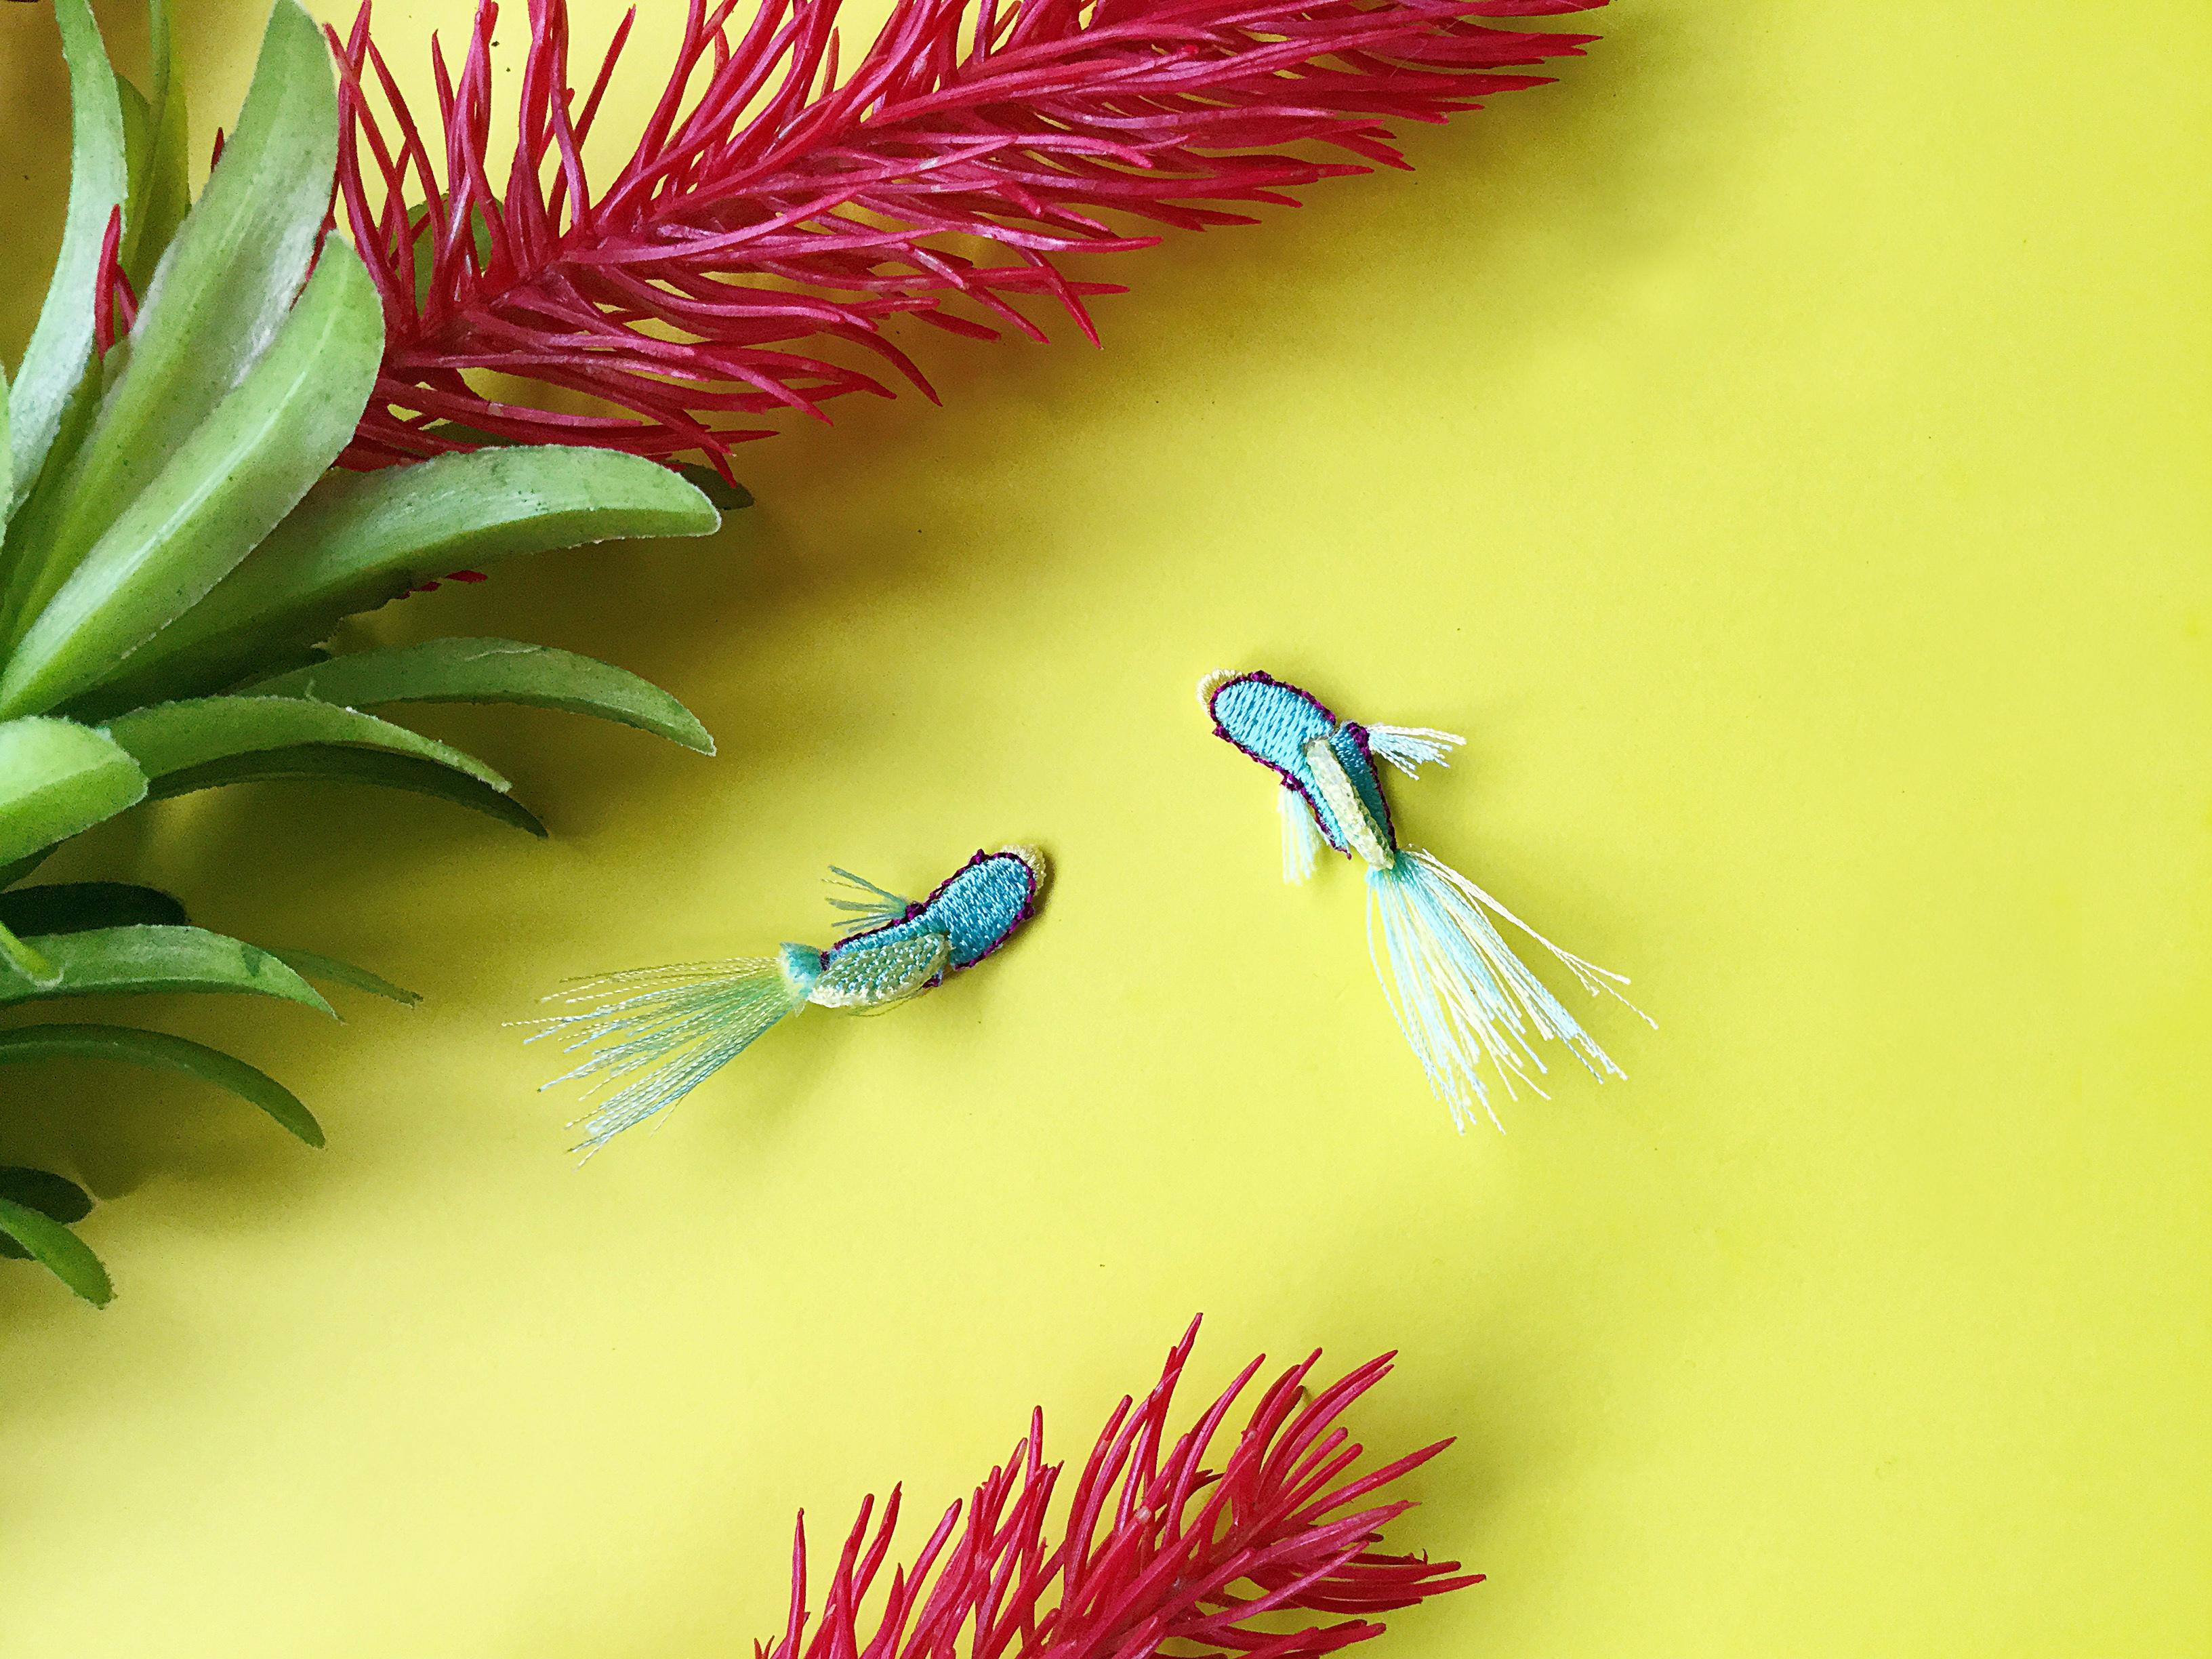 ARRO / 刺繍 / ピアス / イヤリング / TROPICAL FISH / MINT GREEN